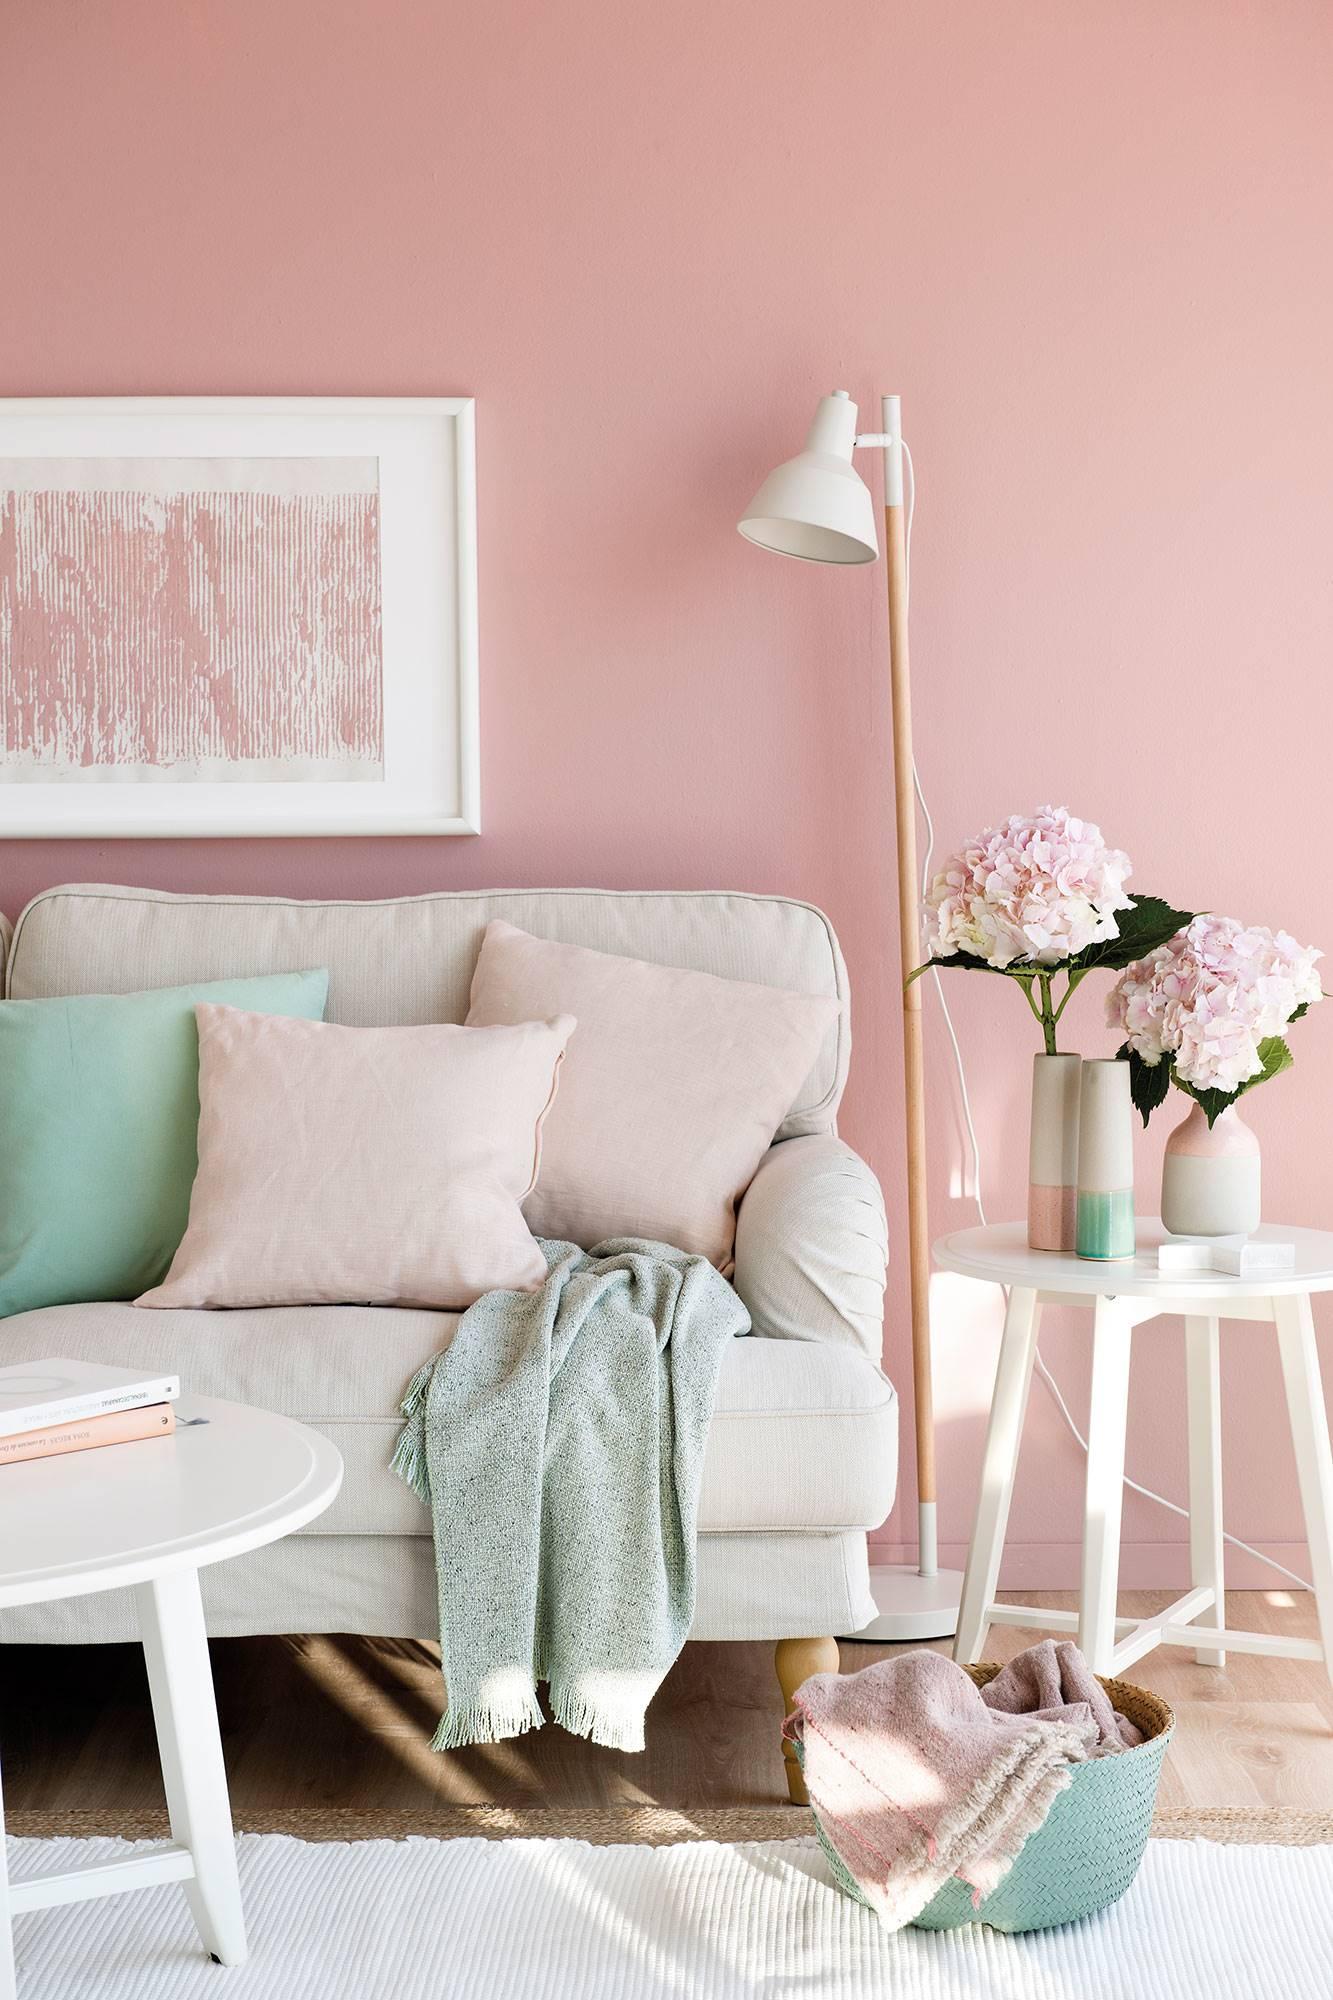 semitoma-de-salon-con-pared-rosa-cojines-rosas 79cf1ef0. Un rosa empolvado que aporta calidez